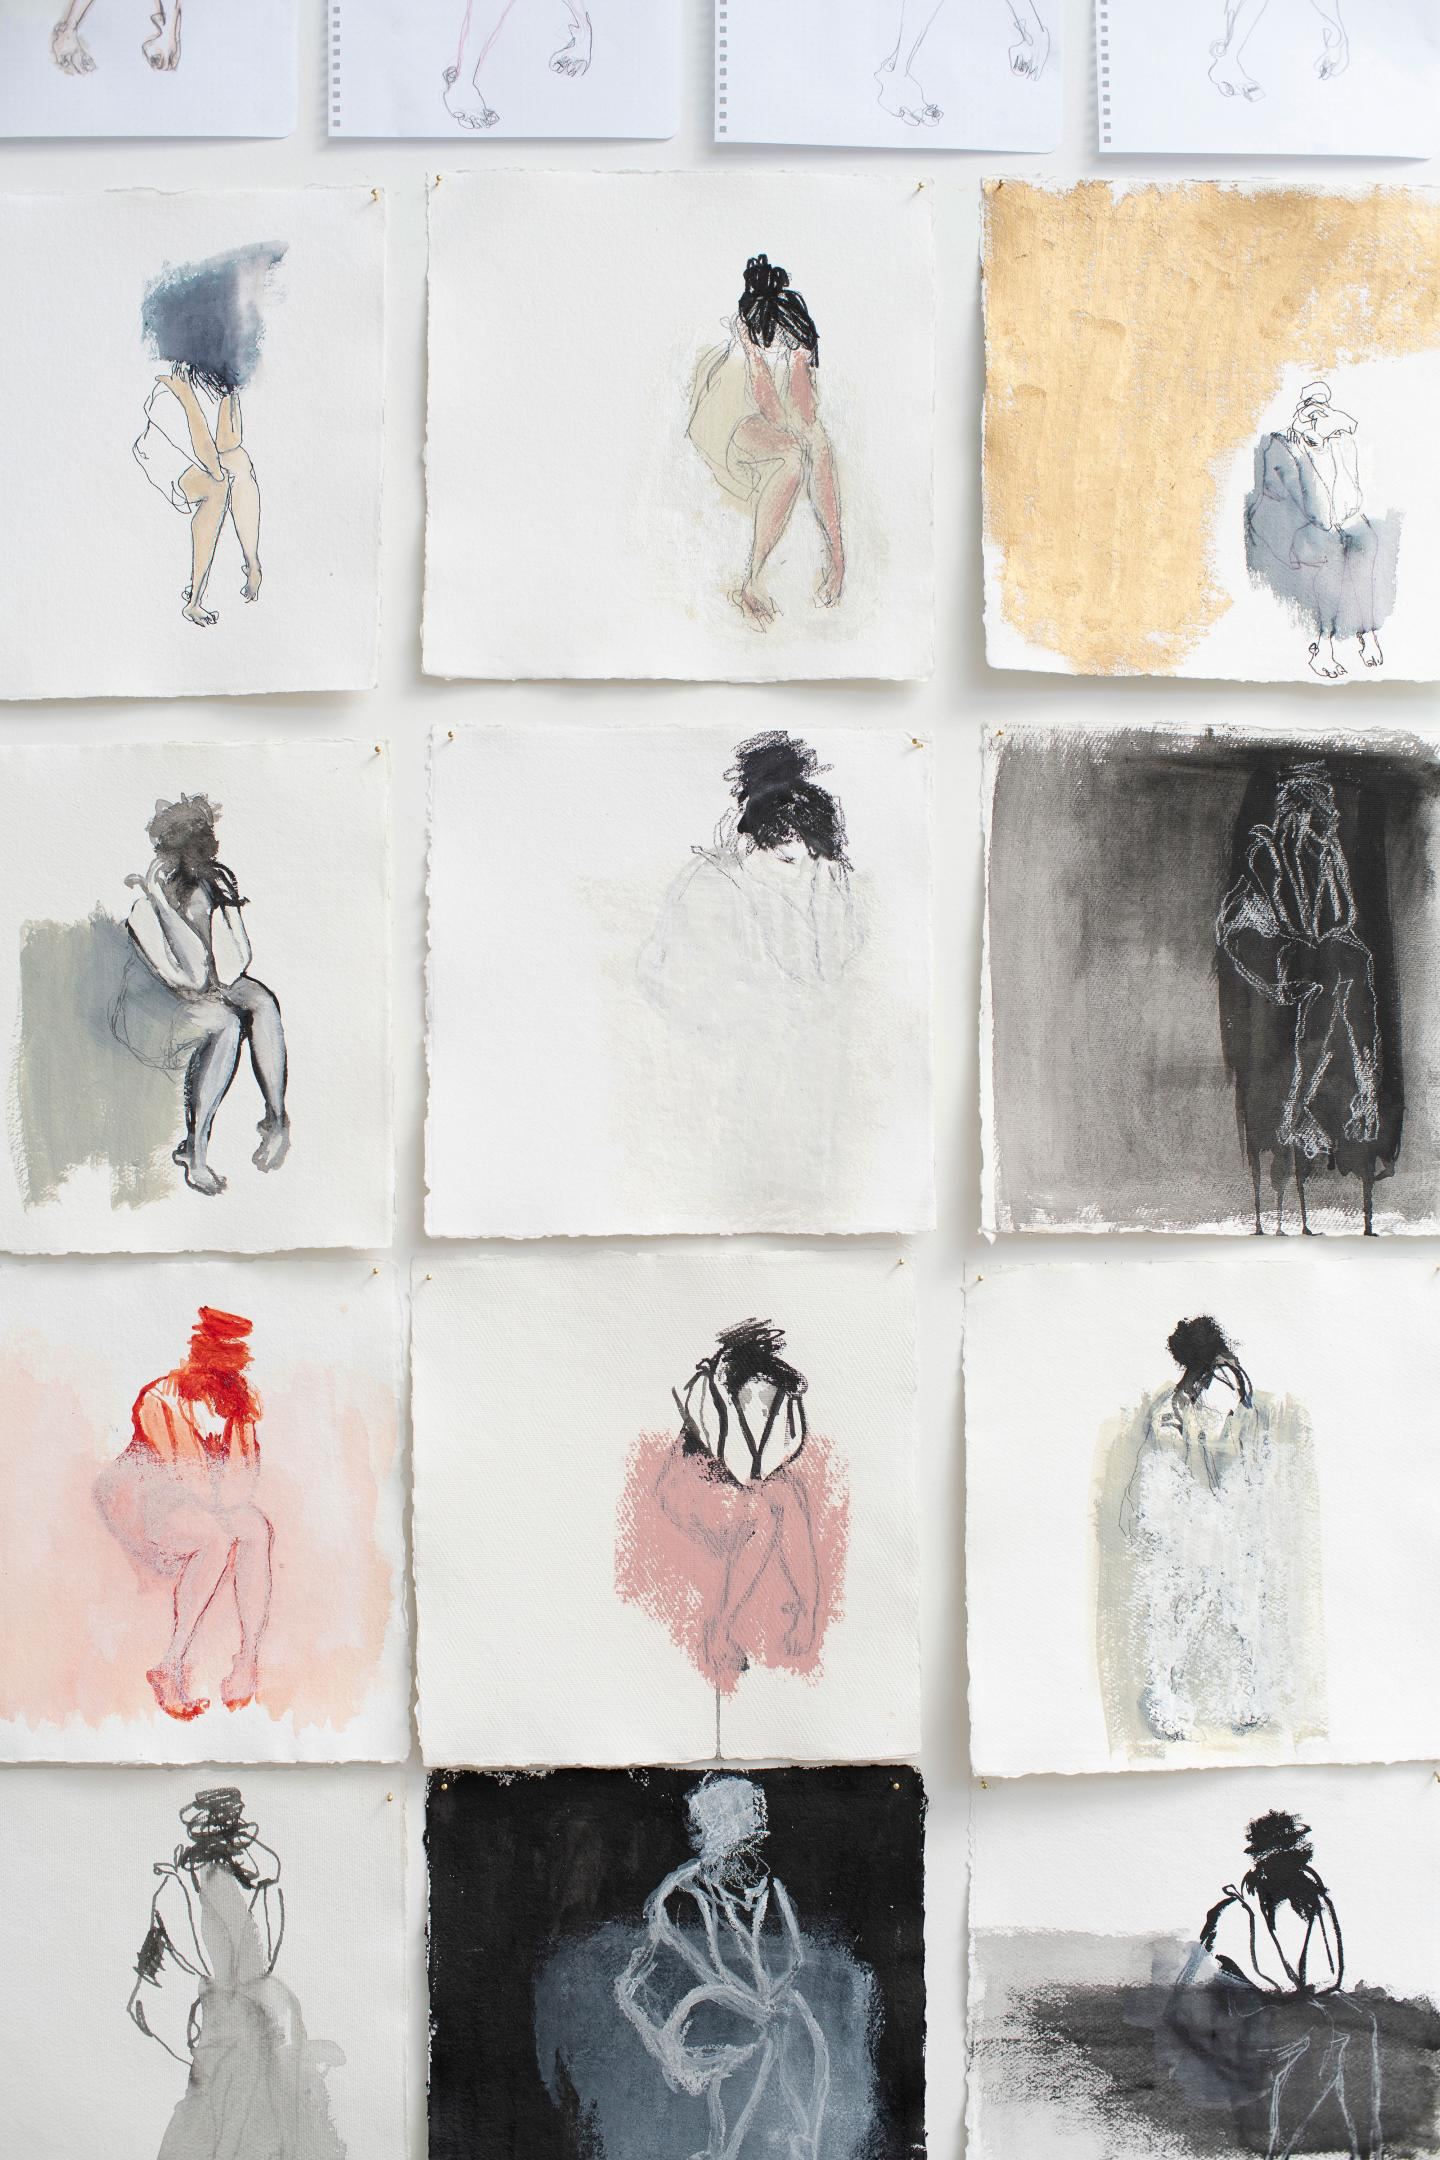 Marina Saleme, 'Apartamento s', 2021, exhibition view, Galeria Luisa Strina, São Paulo. Courtesy: the artist and Galeria Luisa Strina, São Paulo; photograph: Edouard Fraipont